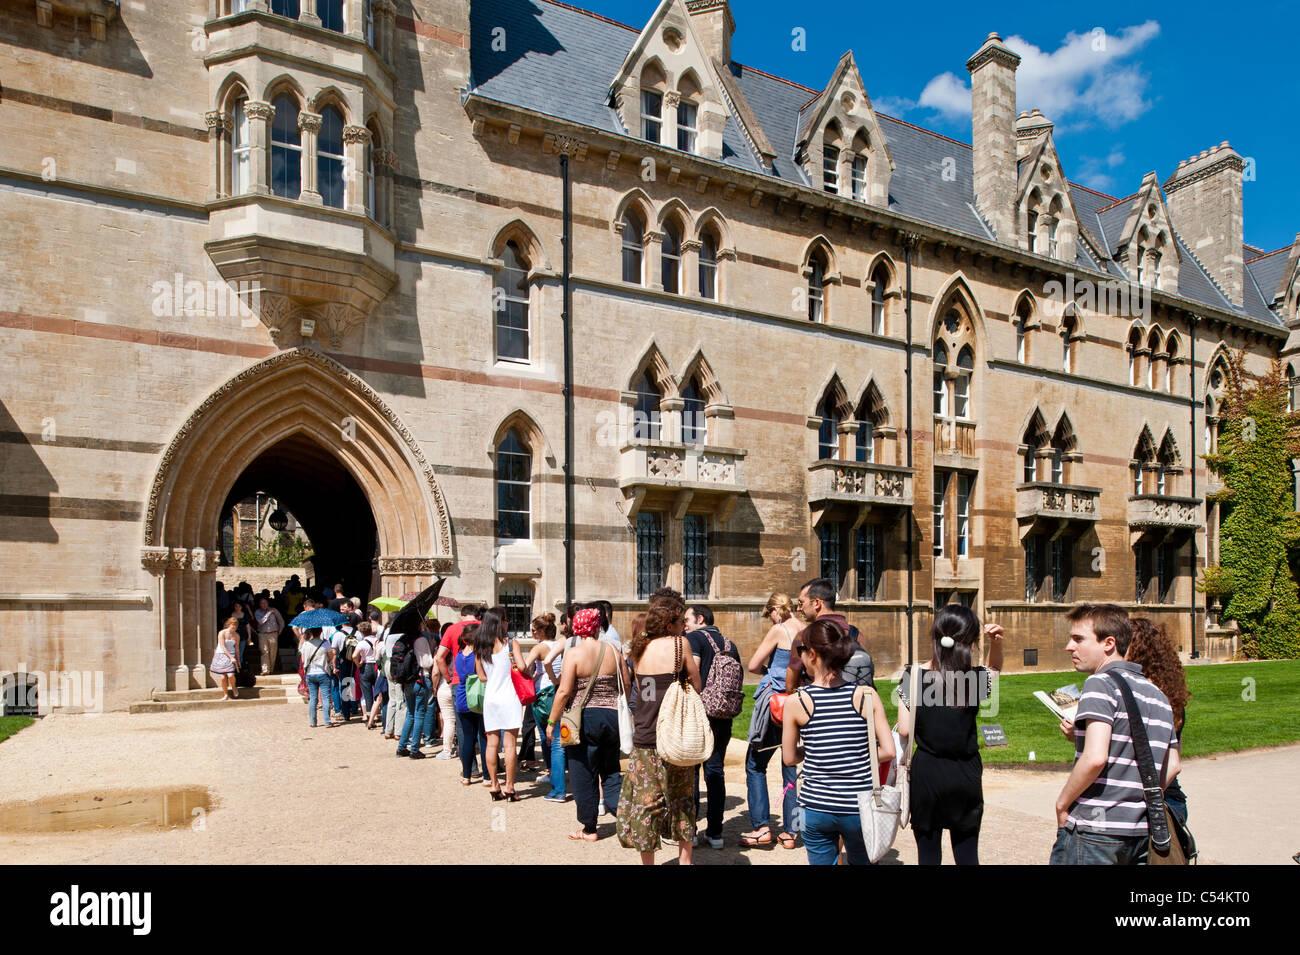 Christ Church, Oxford, Oxfordshire, United Kingdom - Stock Image